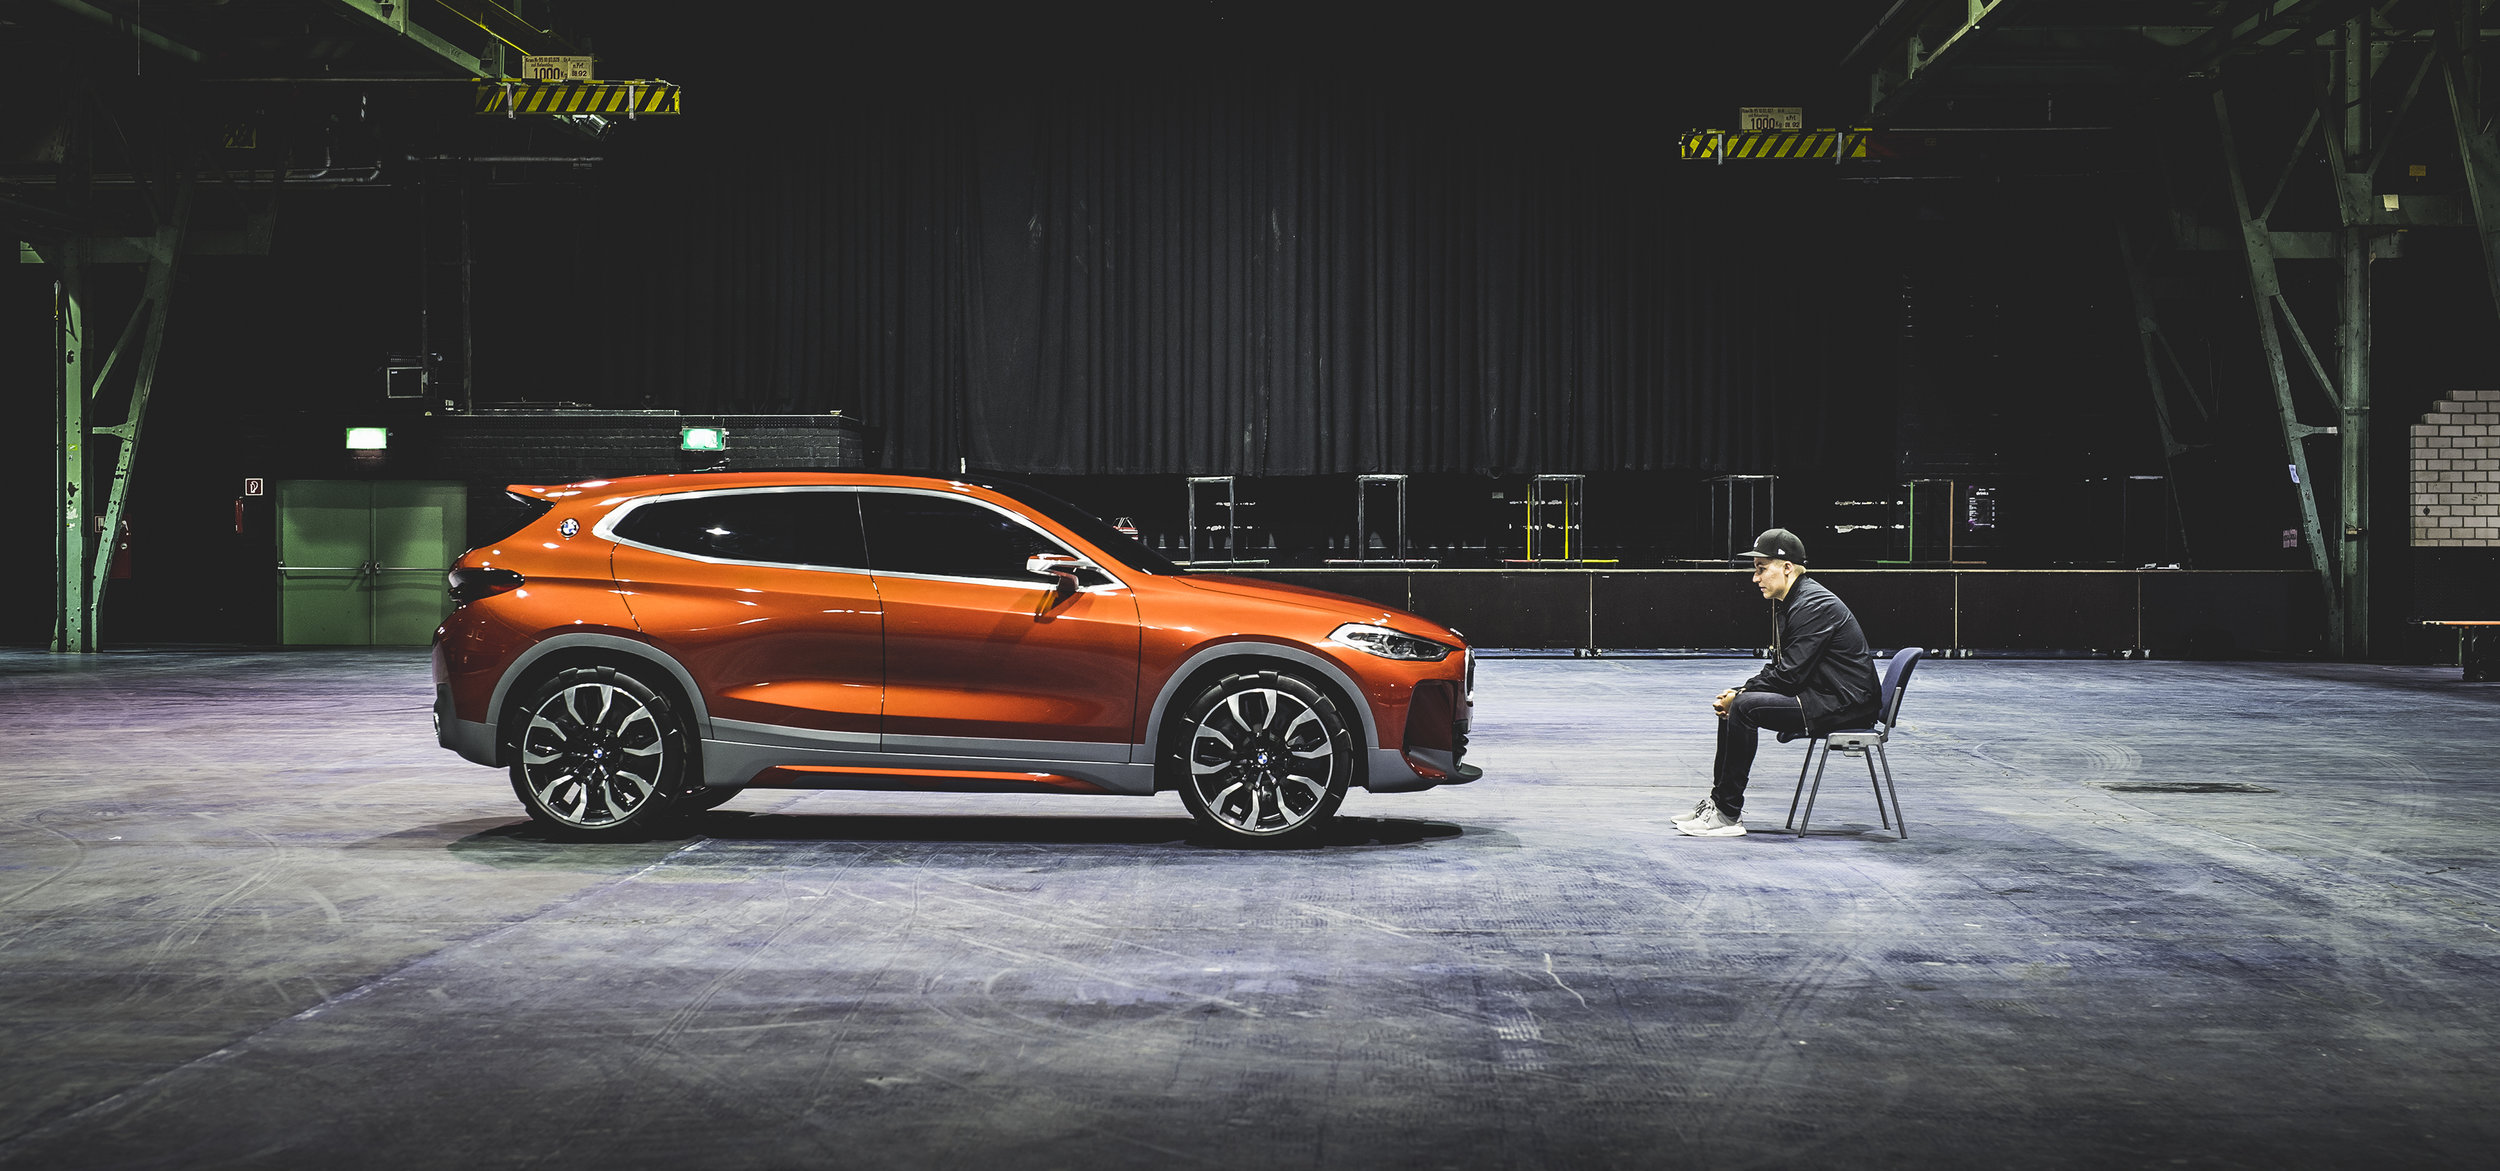 2017 BMW Concept X2, Kim-Christopher Granz